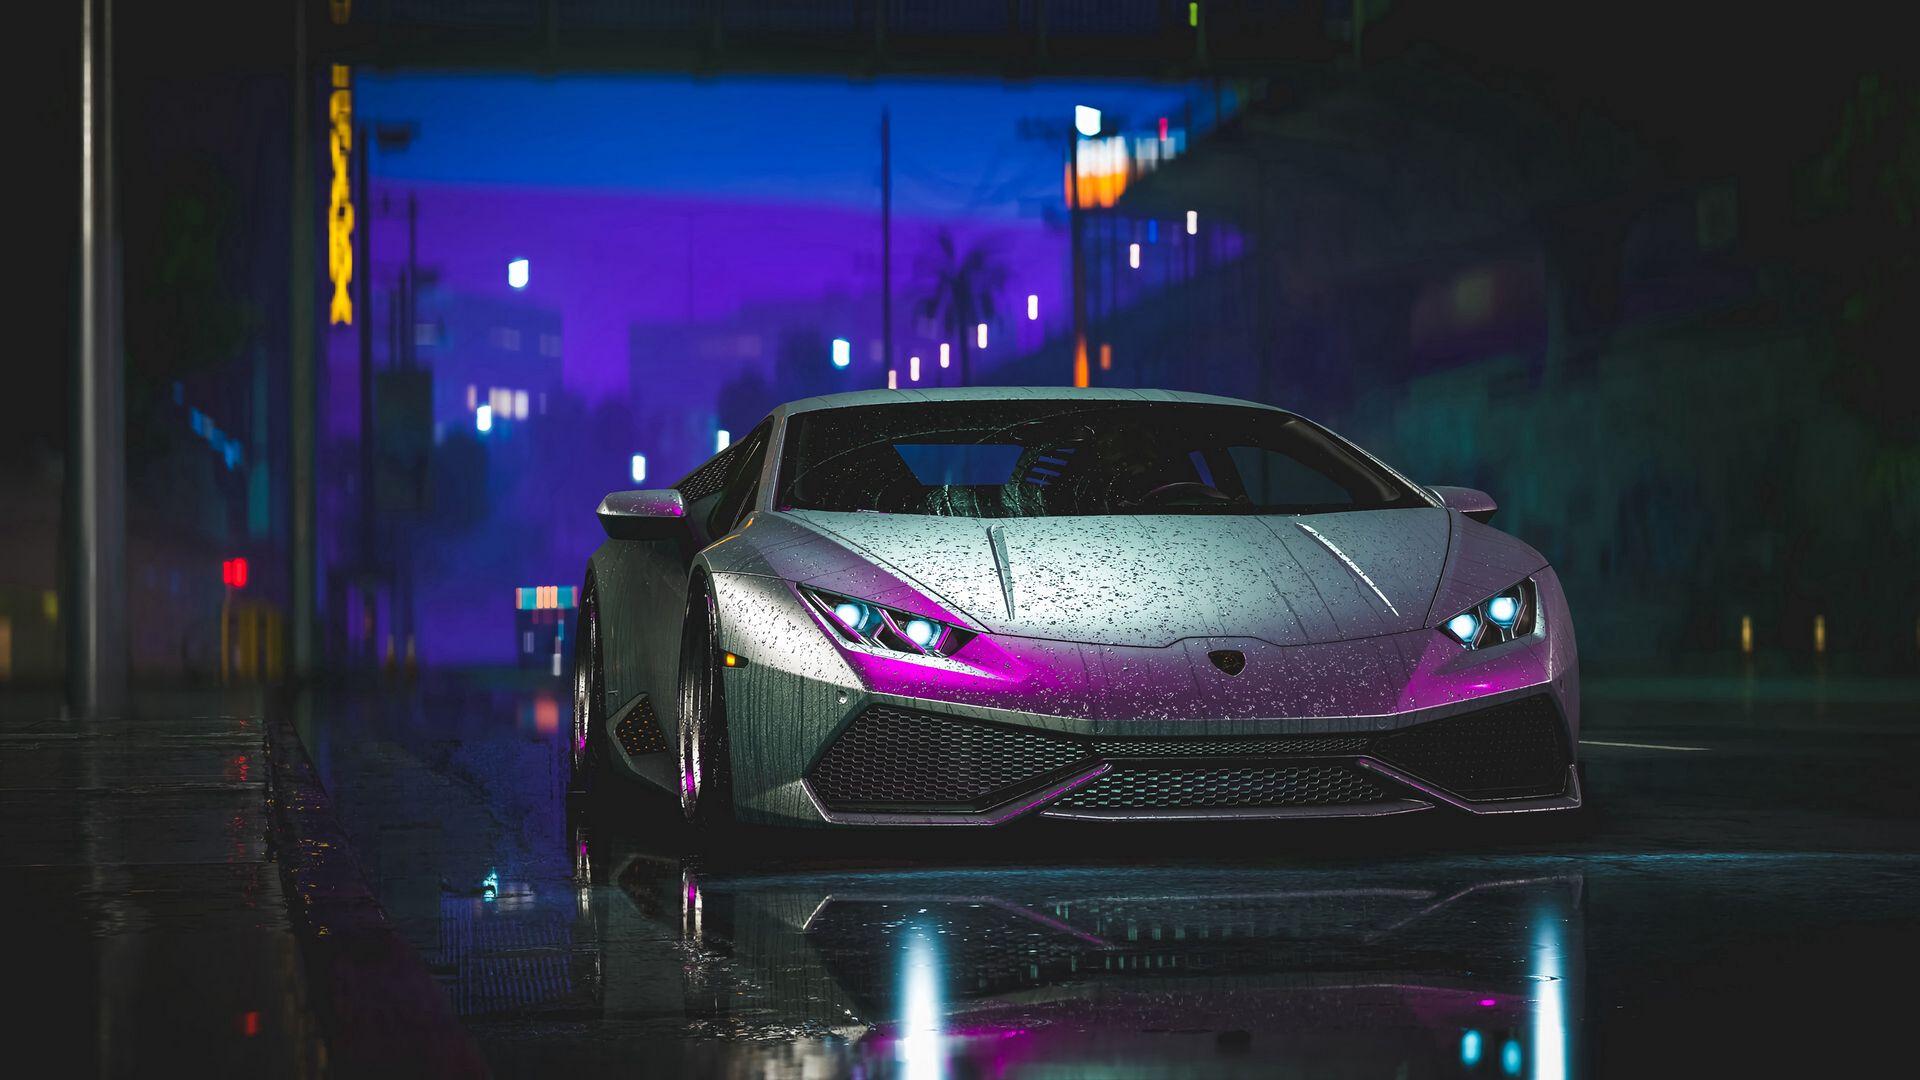 The Best Wallpapers Related to Lamborghini Aventador, Lamborghini, Sportscar (2)